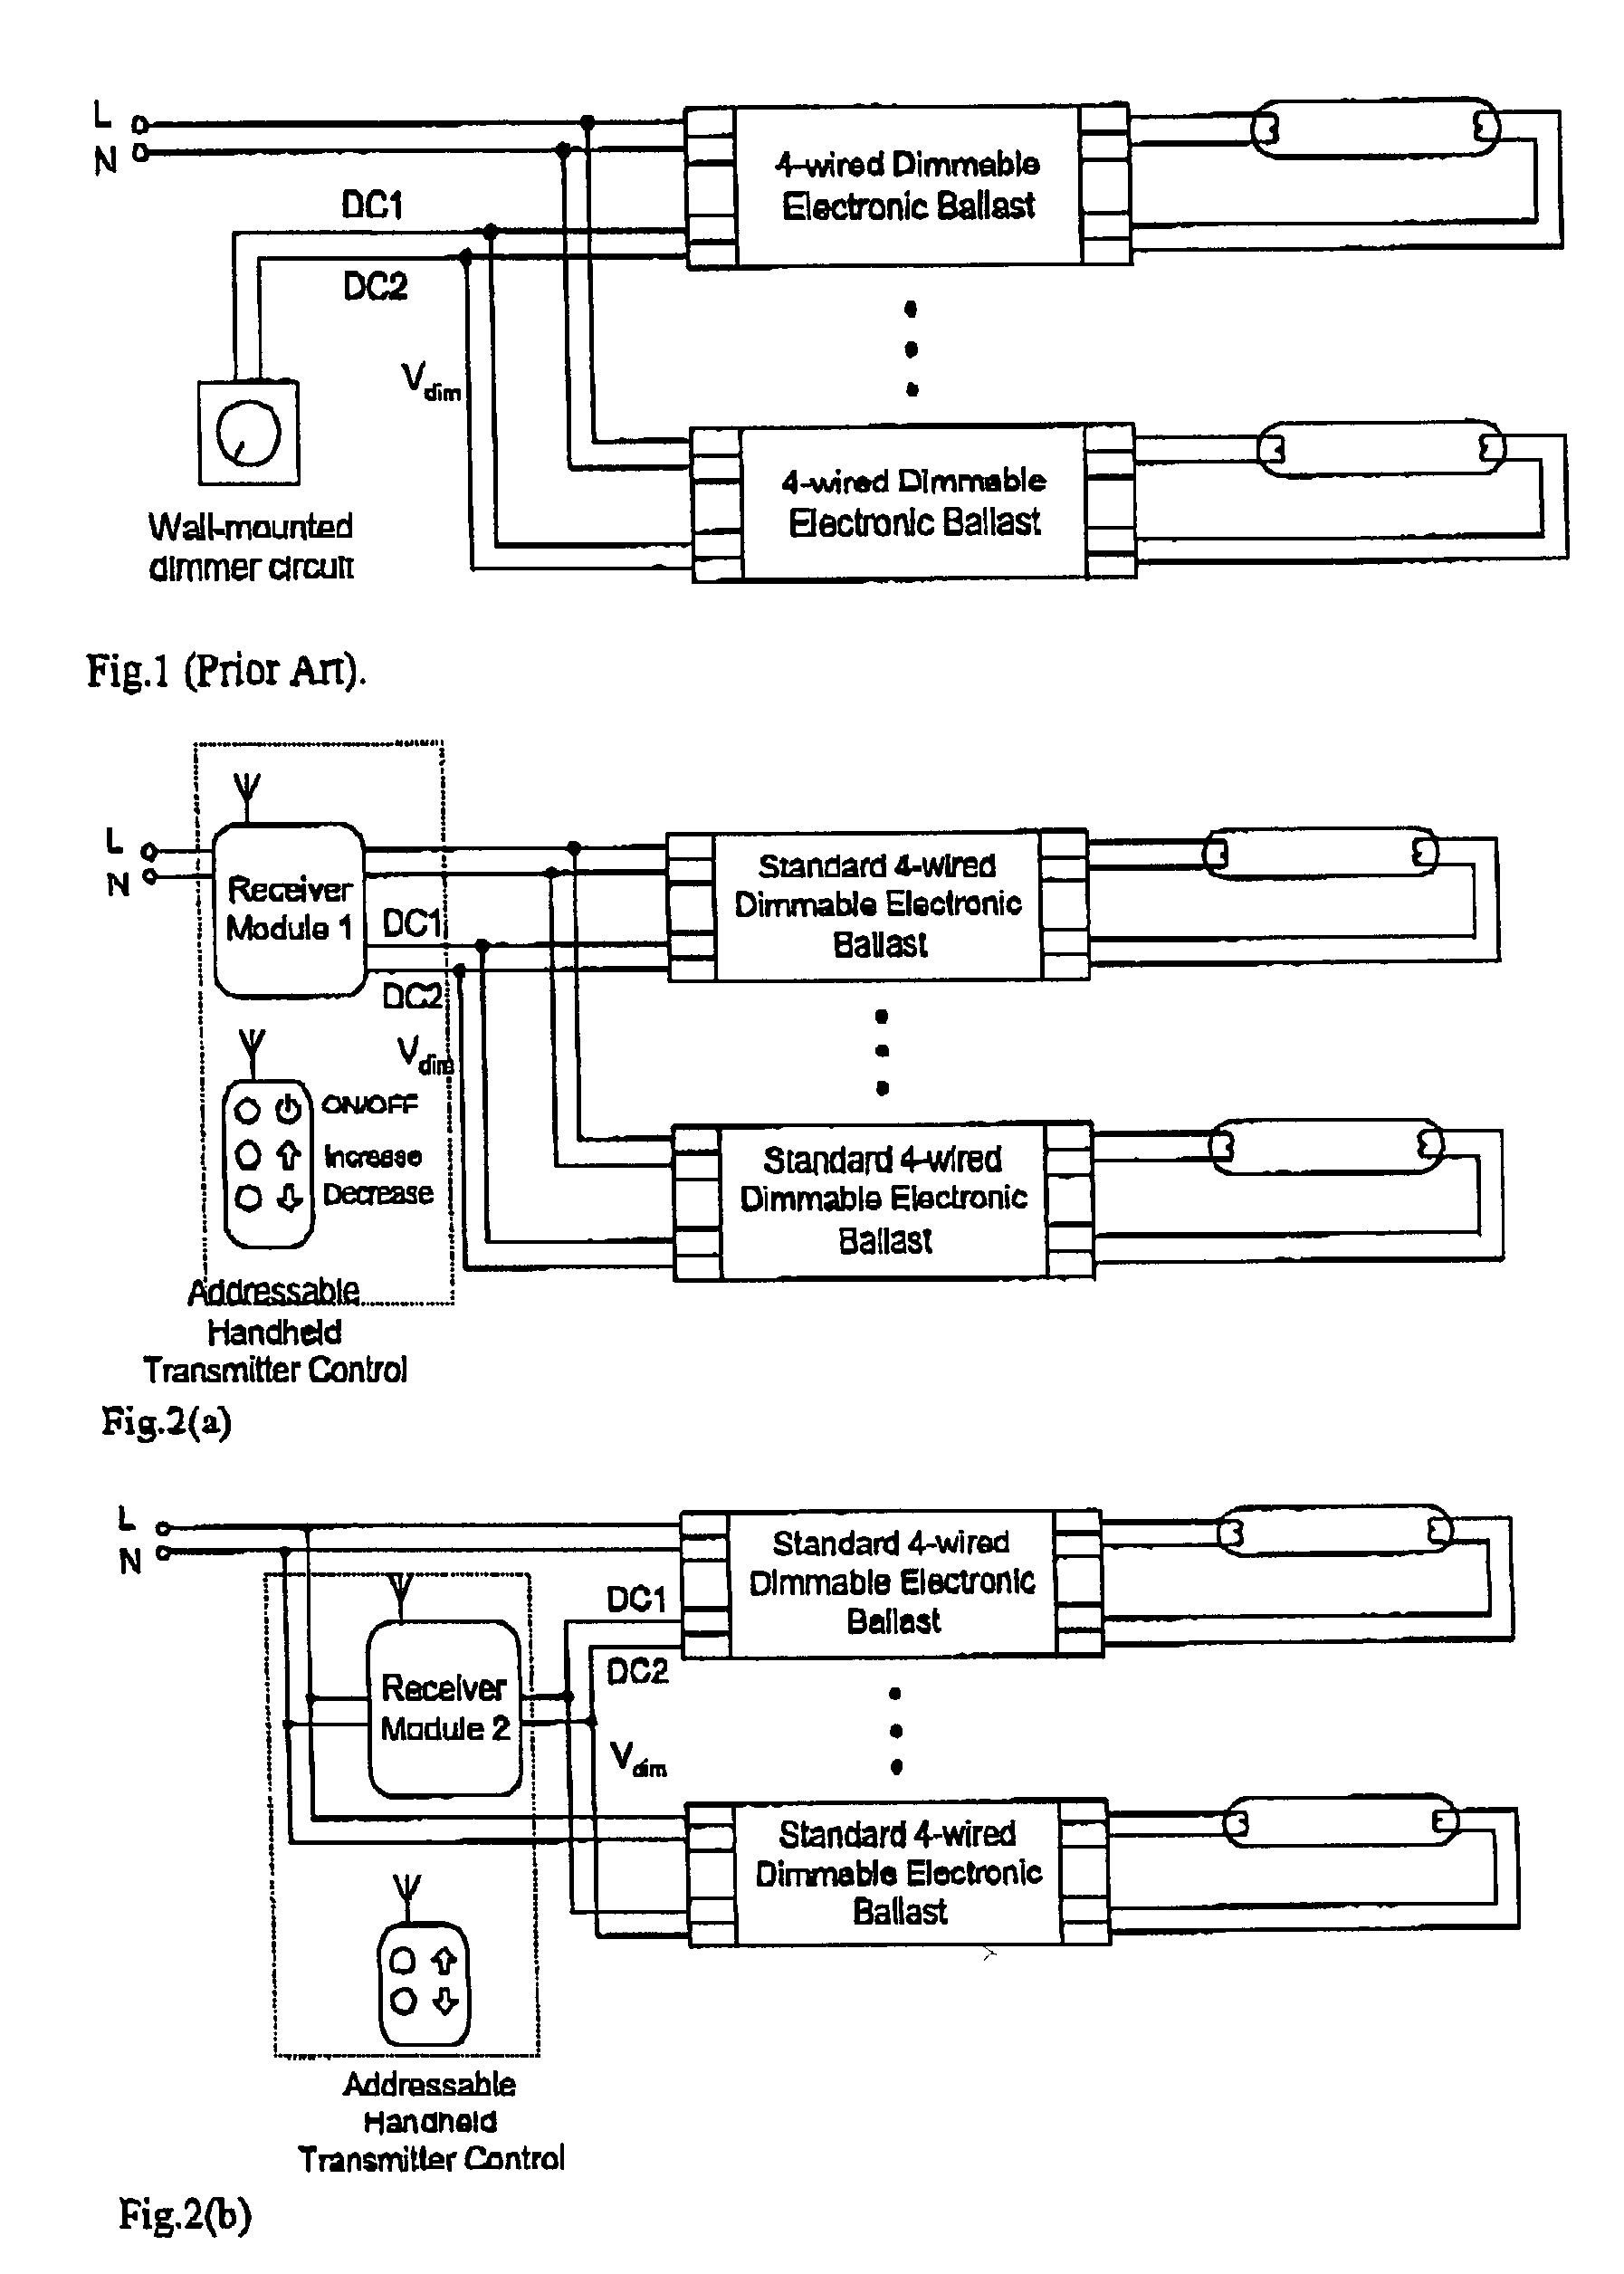 [SCHEMATICS_4US]  FH_3264] 2 Lamp T12 Ballast Wiring Diagram Free Diagram | Sylvania Ballast Wiring Diagram |  | Dict Pala Bletu Subd Cran Junap Mohammedshrine Librar Wiring 101